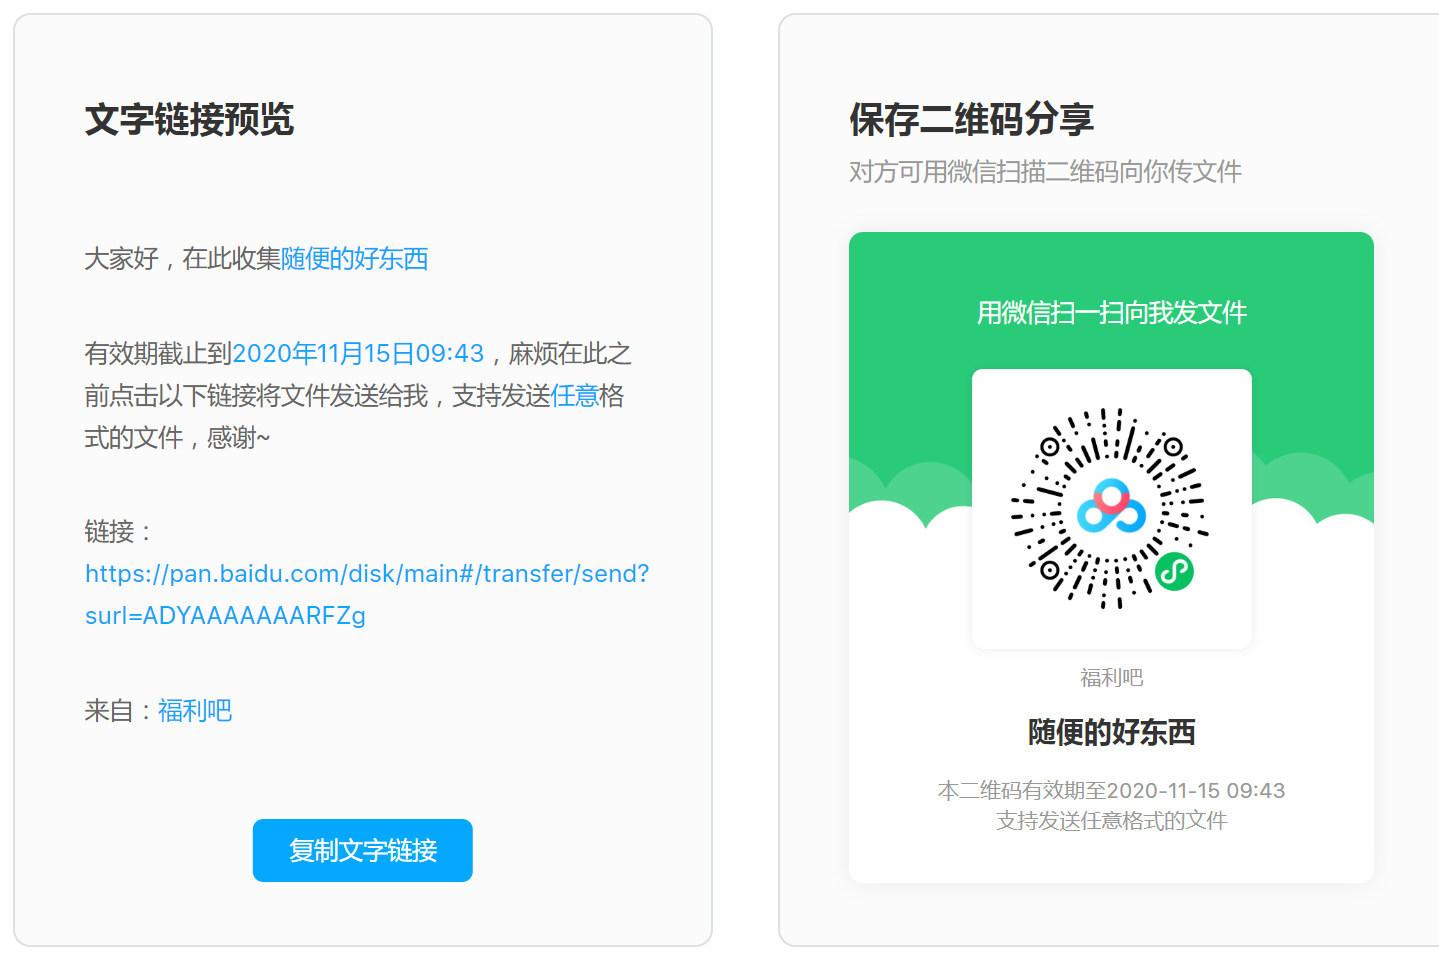 fulibus.net福利吧2020-11-14_01